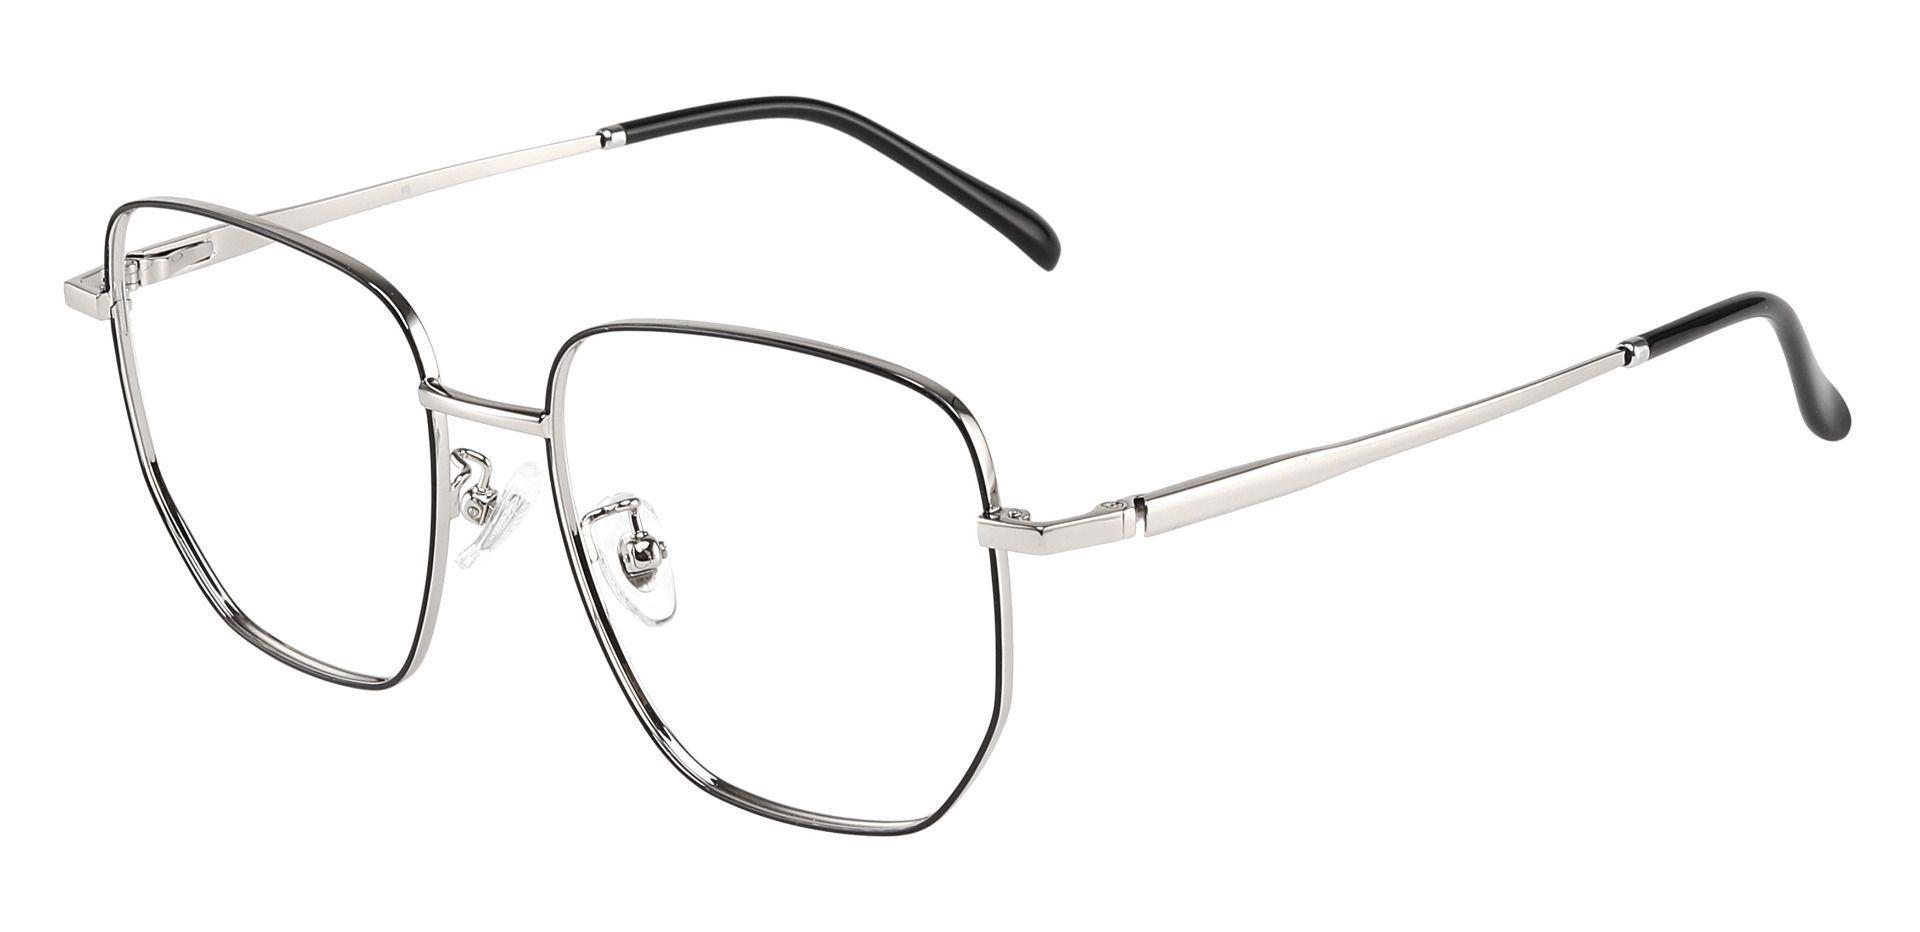 Swayze Geometric Prescription Glasses - Black